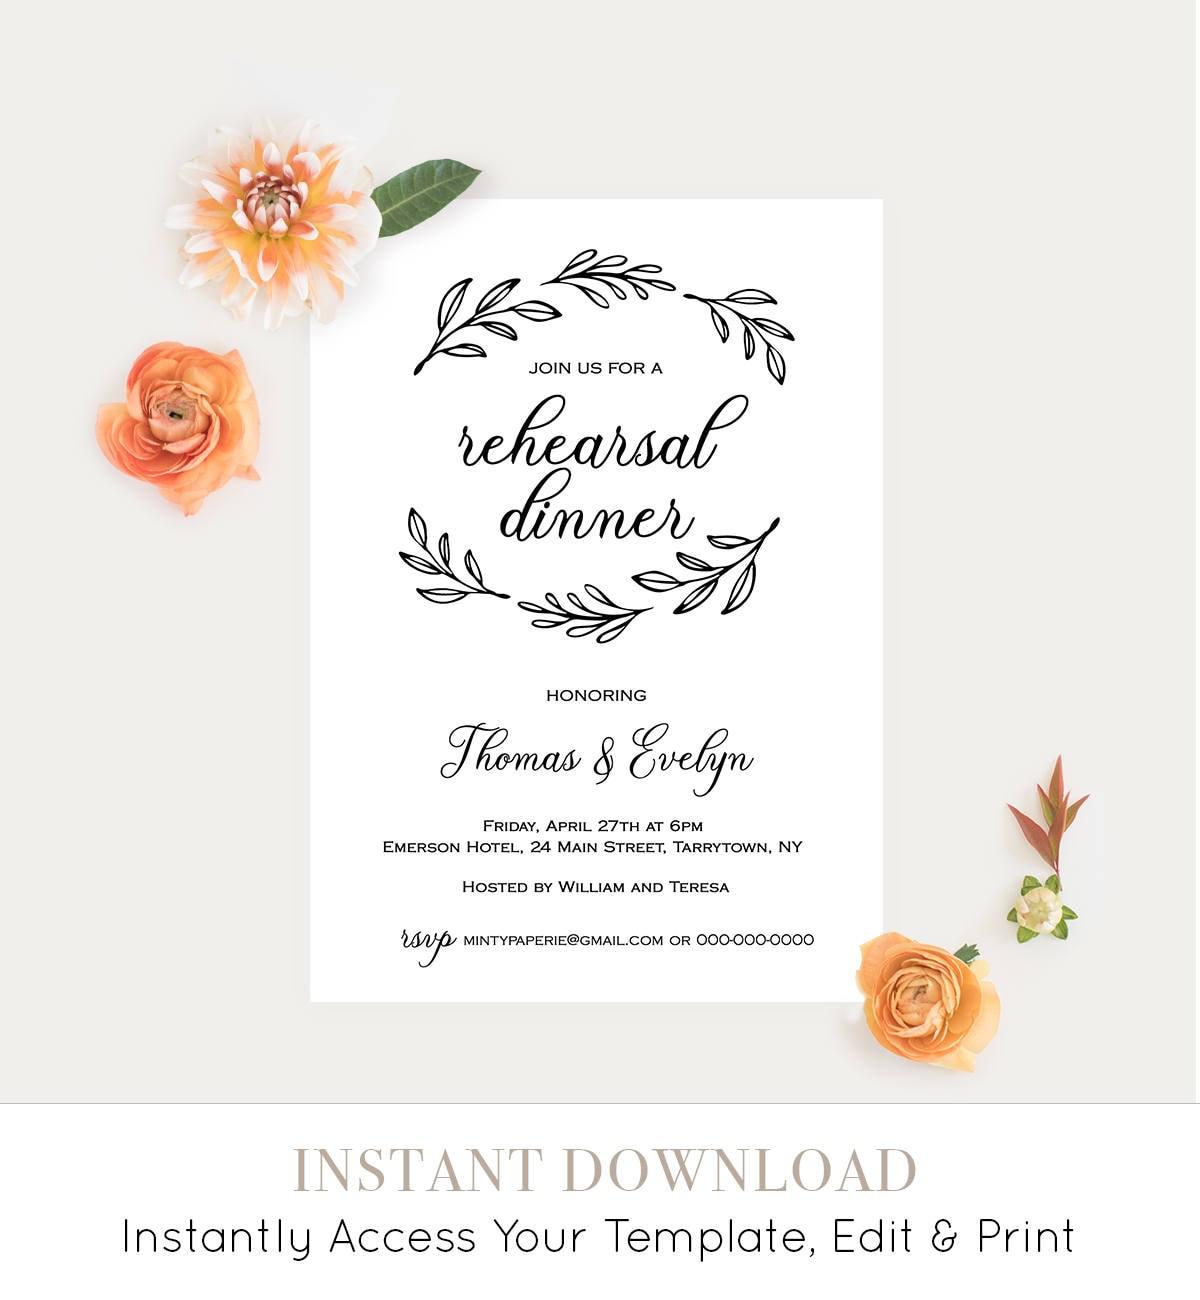 Rehearsal Dinner Invitation Printable, Rustic Wedding Rehearsal ...